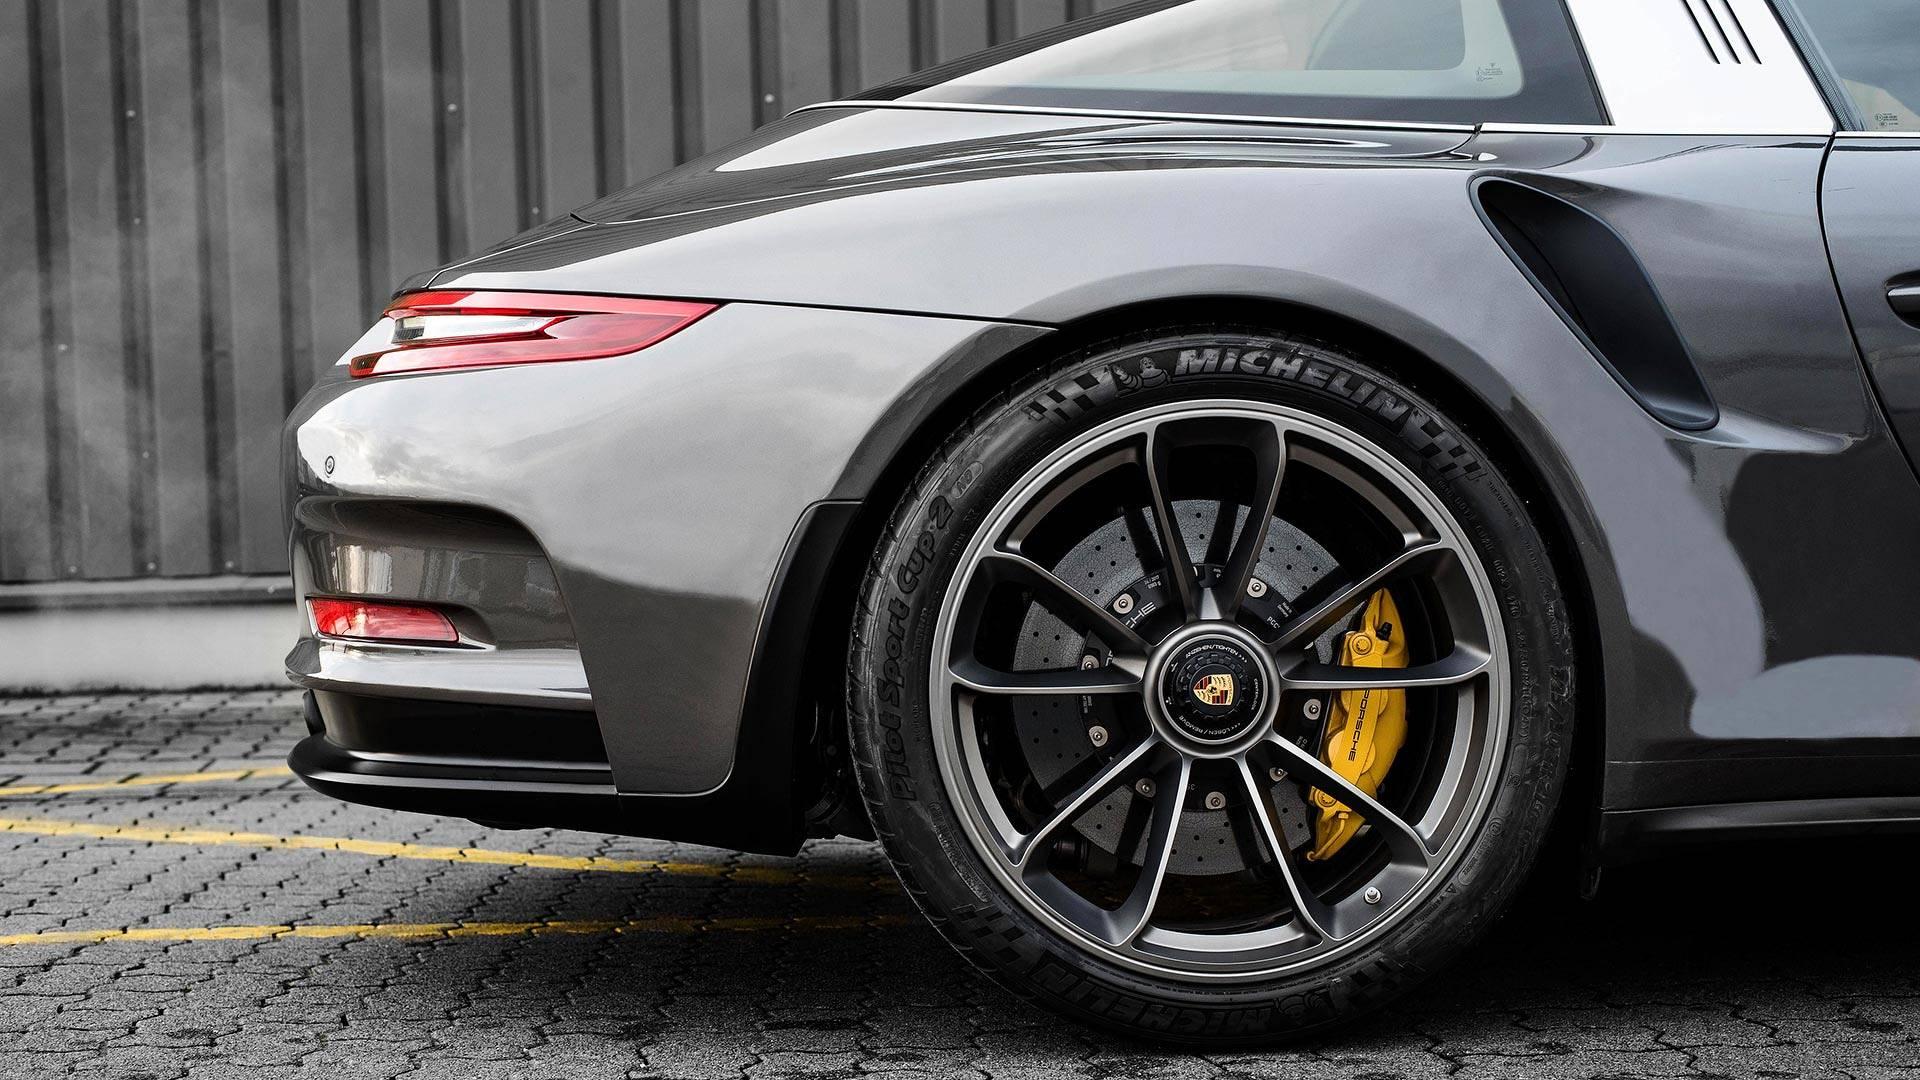 Porsche_911_Targa_GT3_by_Mcchip-dkr_0008